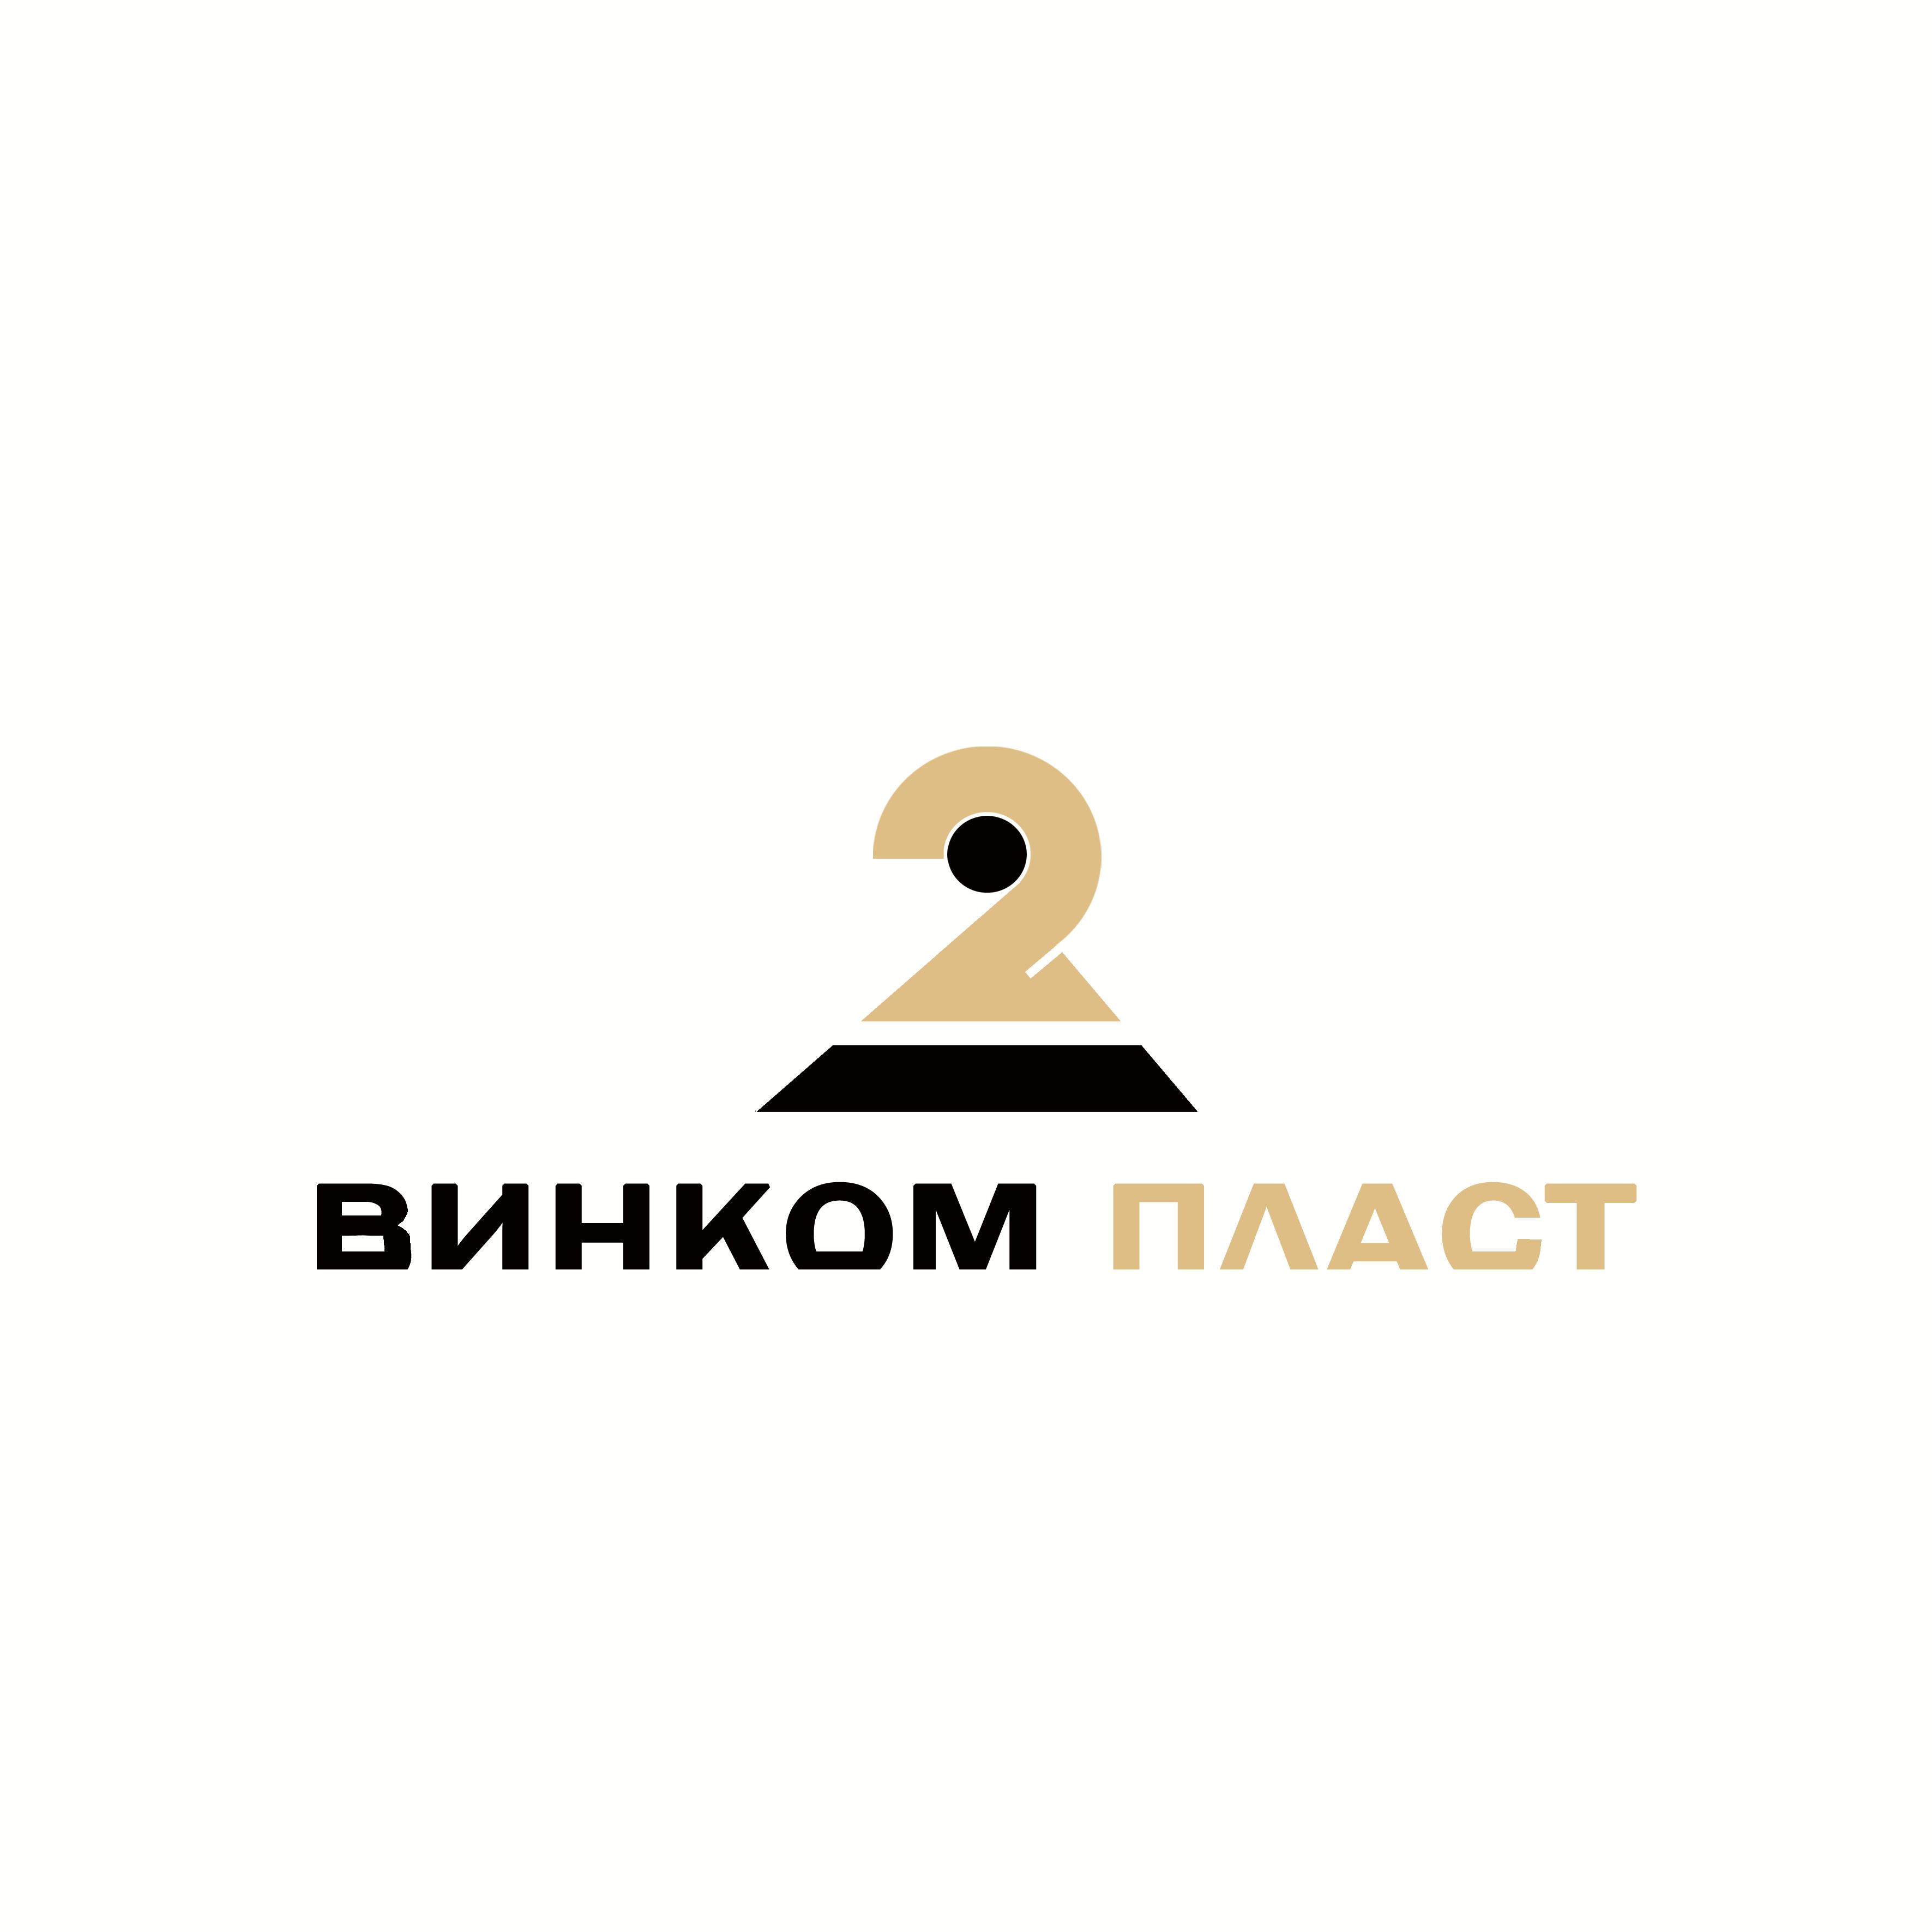 Логотип, фавикон и визитка для компании Винком Пласт  фото f_4345c35e8ef92c35.jpg